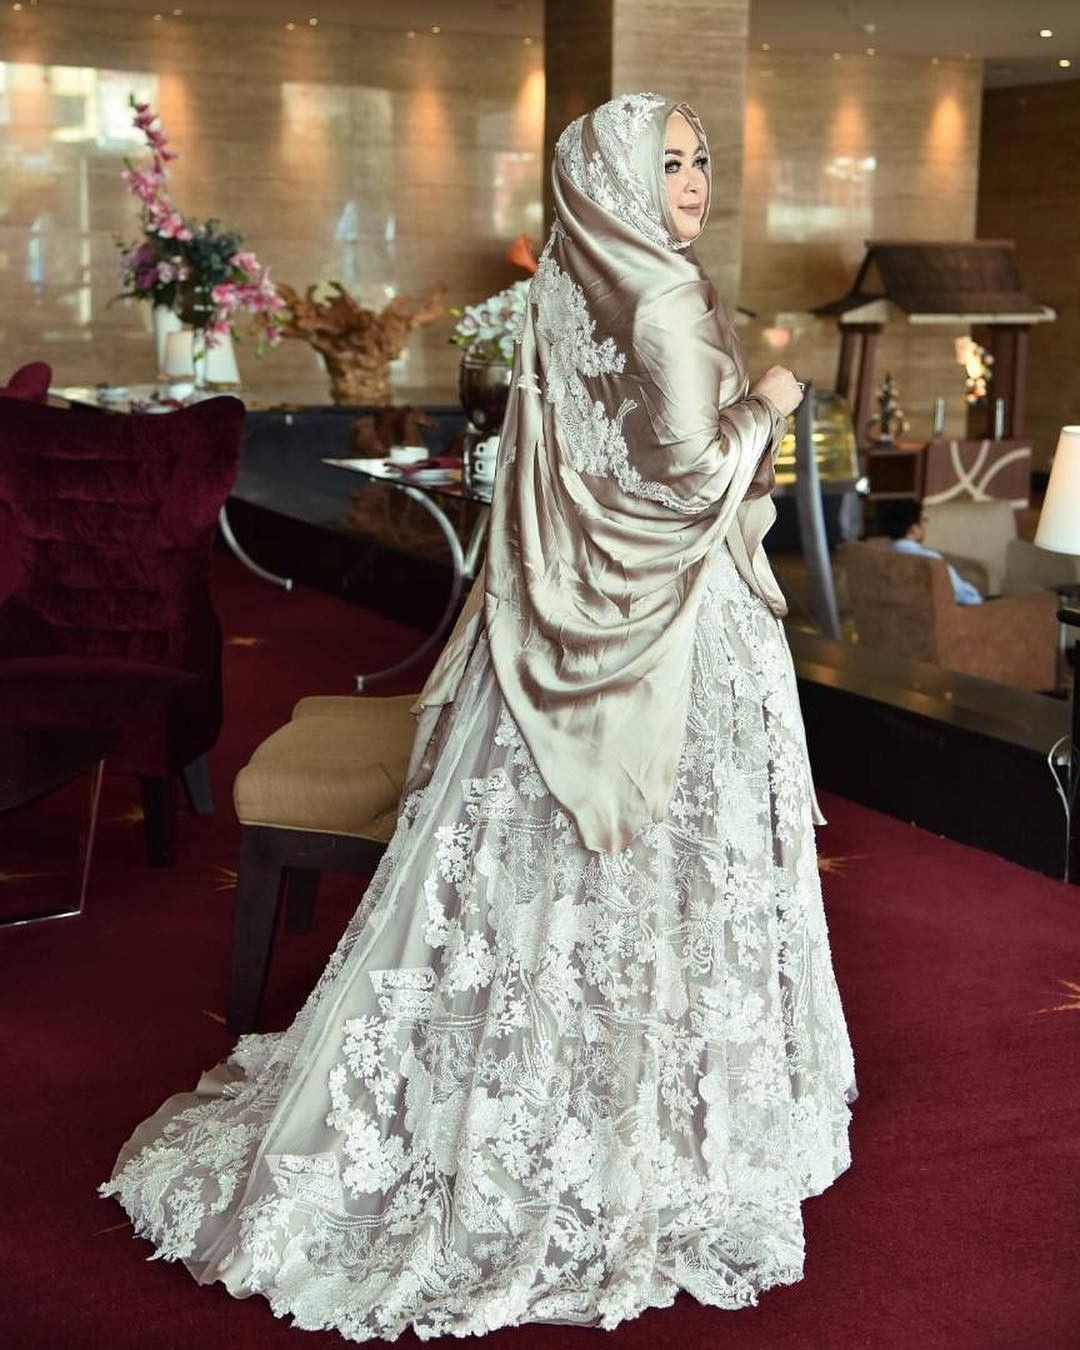 Bentuk Gaun Pernikahan Muslimah Syar'i E9dx Gaun Pengantin Syar I Hitam Inspirasi Pernikahan